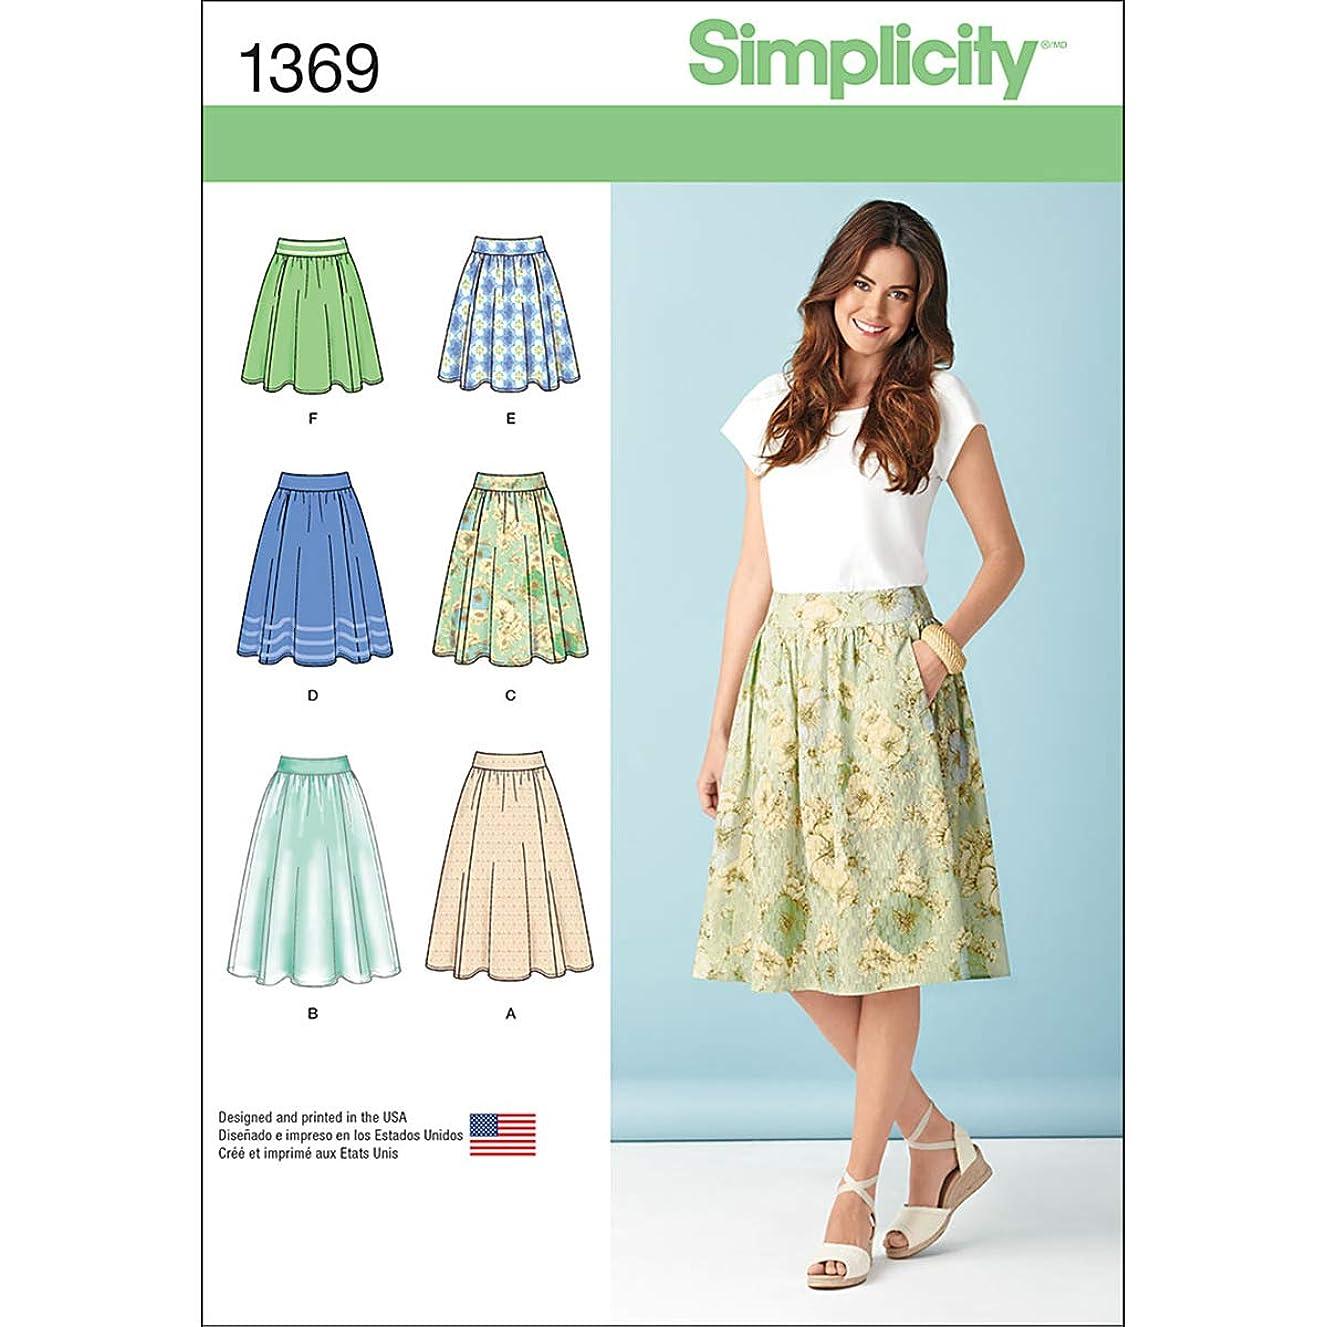 Simplicity 1369 Women's Skirt Sewing Pattern, Sizes 14-22